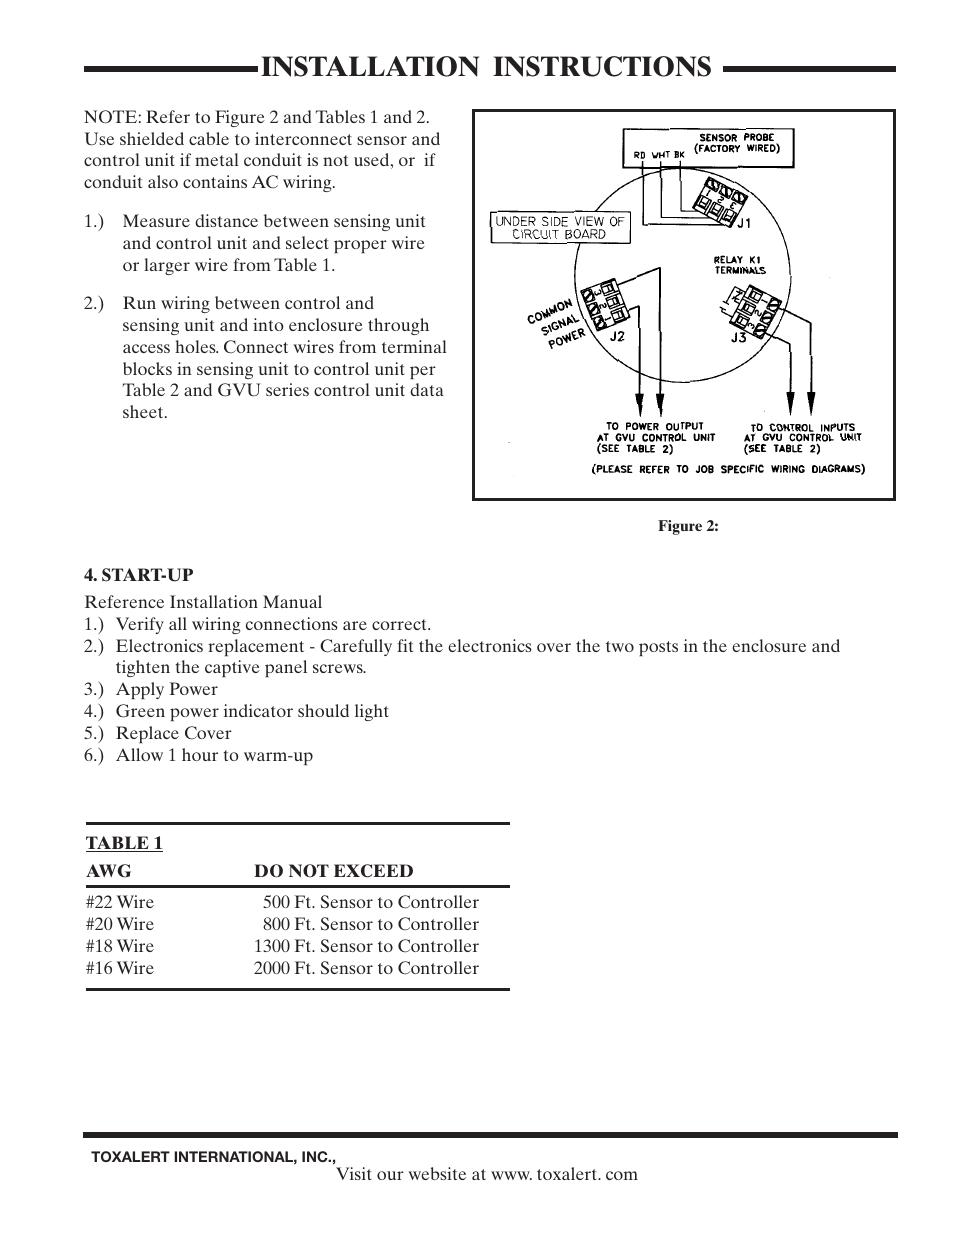 Installation Instructions Toxalert Gvu No2 User Manual Page 3 4 4541 Datasheet